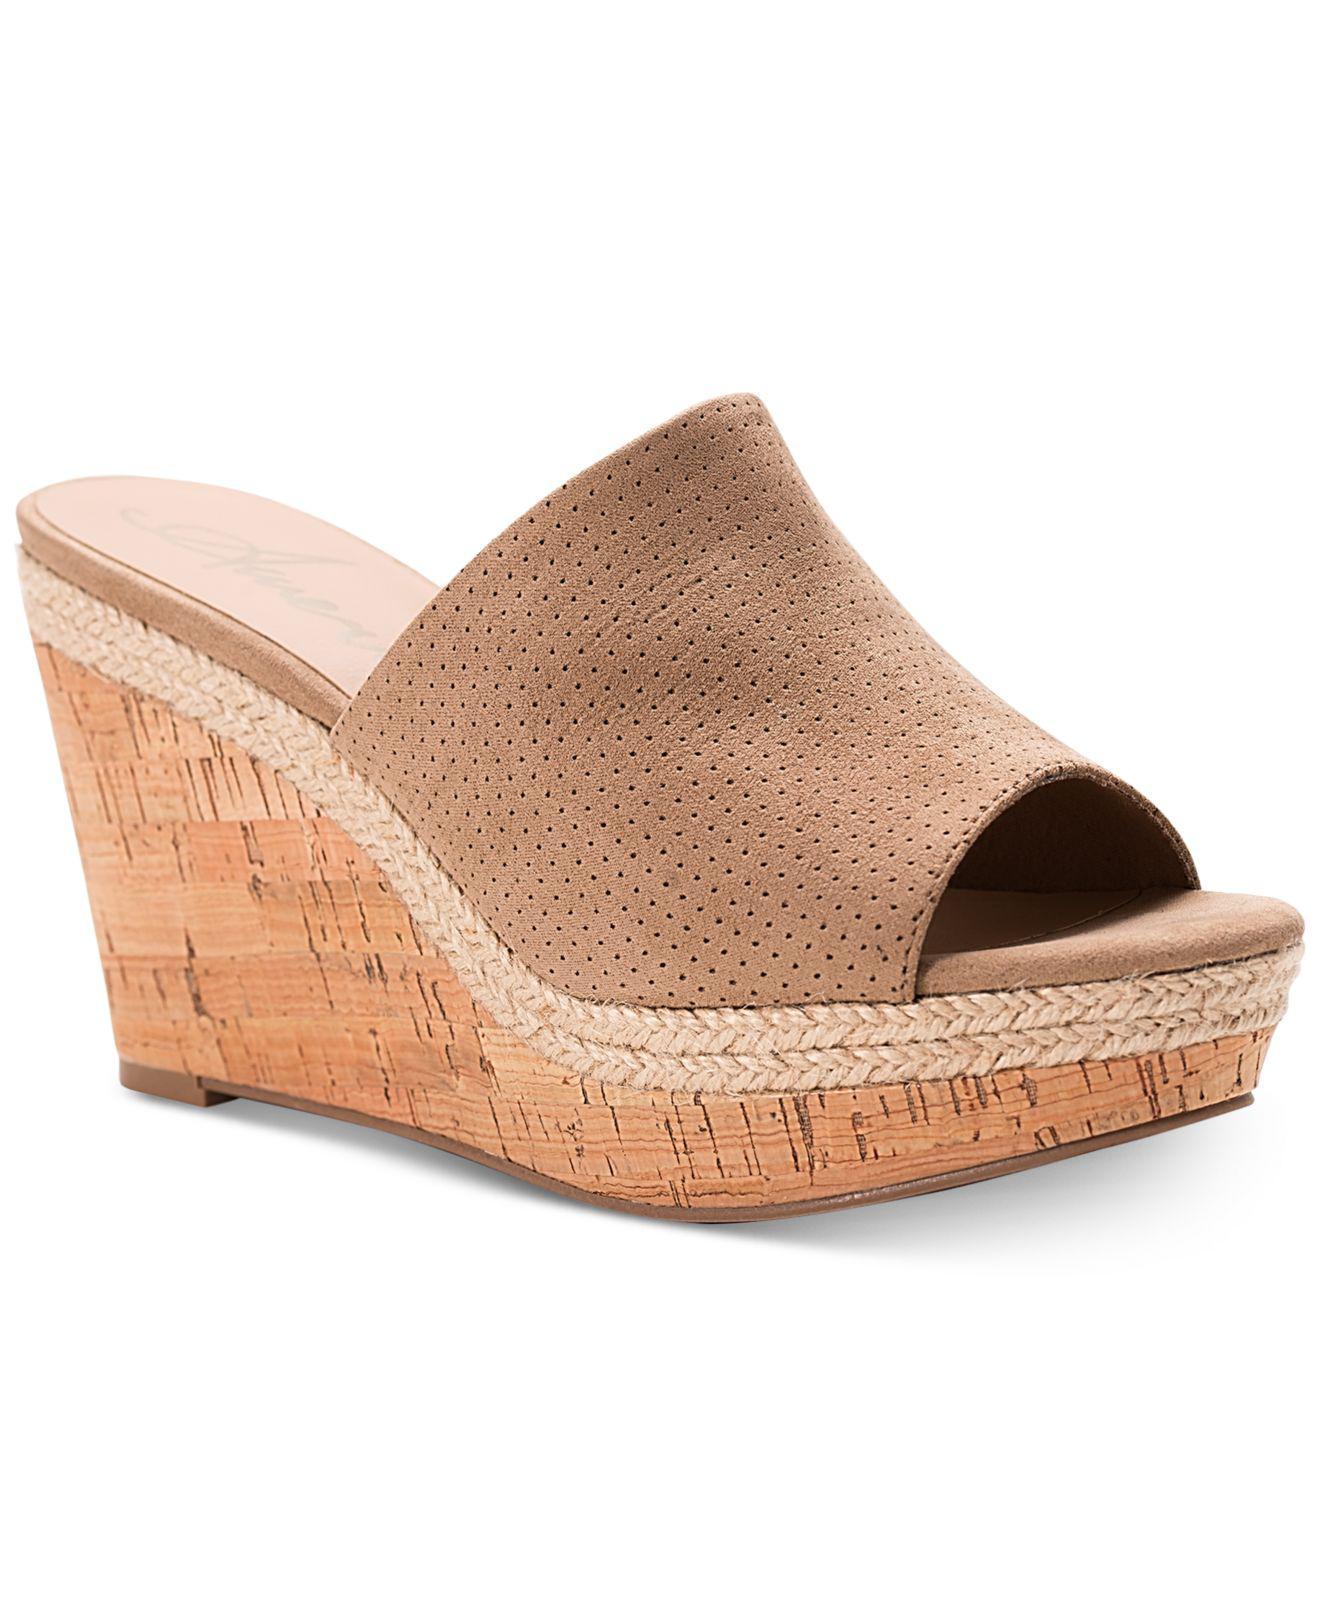 2e09170e7 American Rag. Women s Natural Shira Platform Wedge Sandals